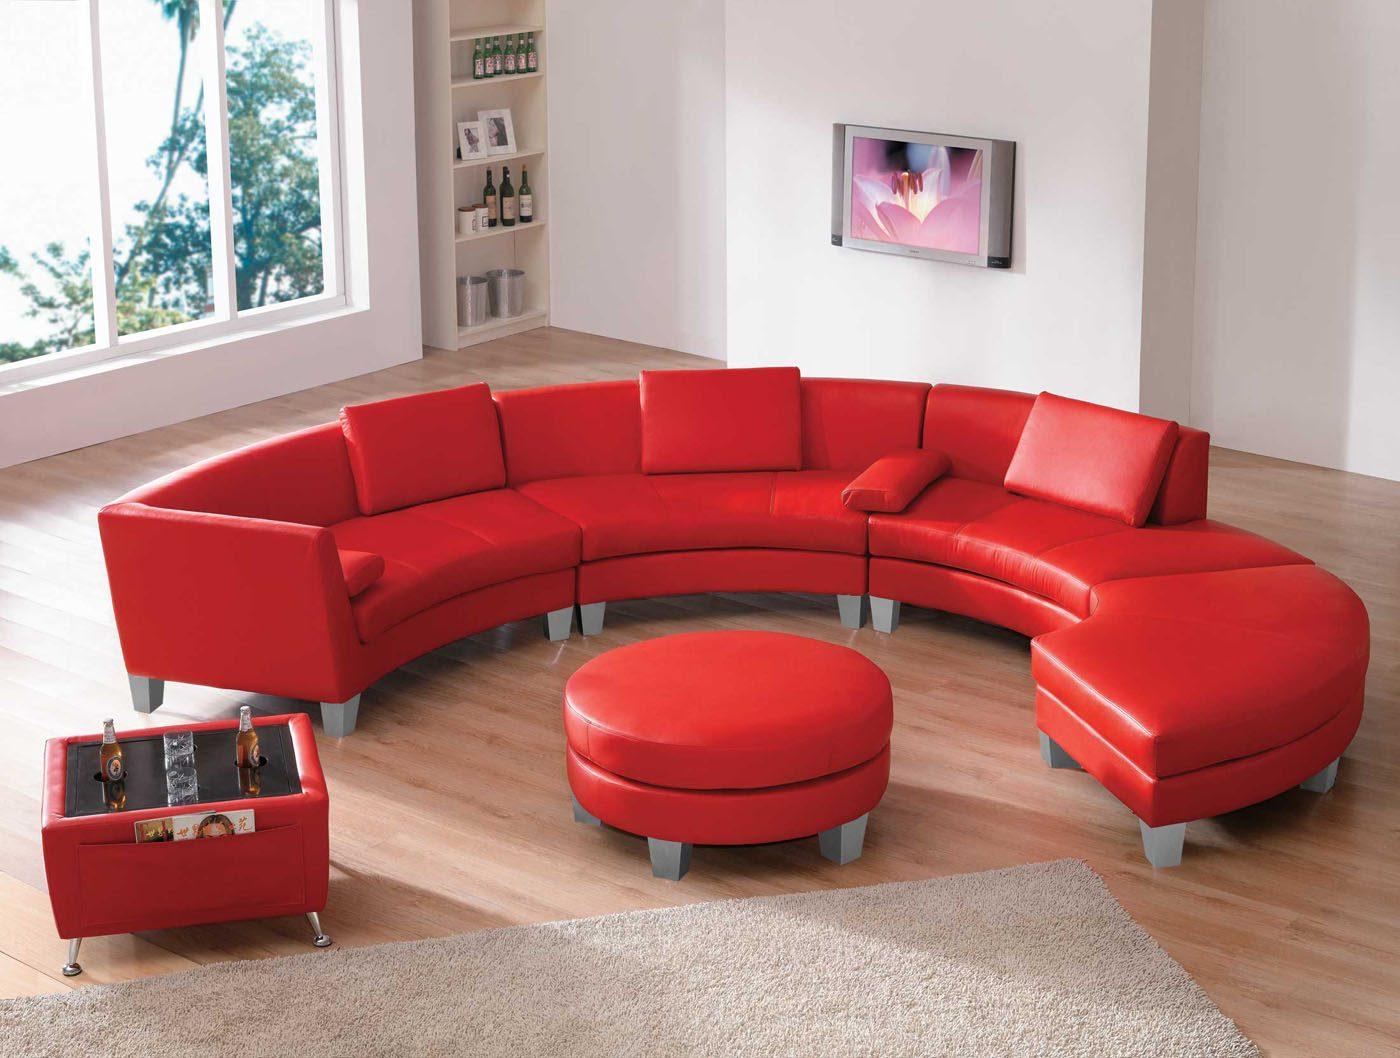 Galer a de im genes muebles modernos para el sal n for Muebles de sala modernos